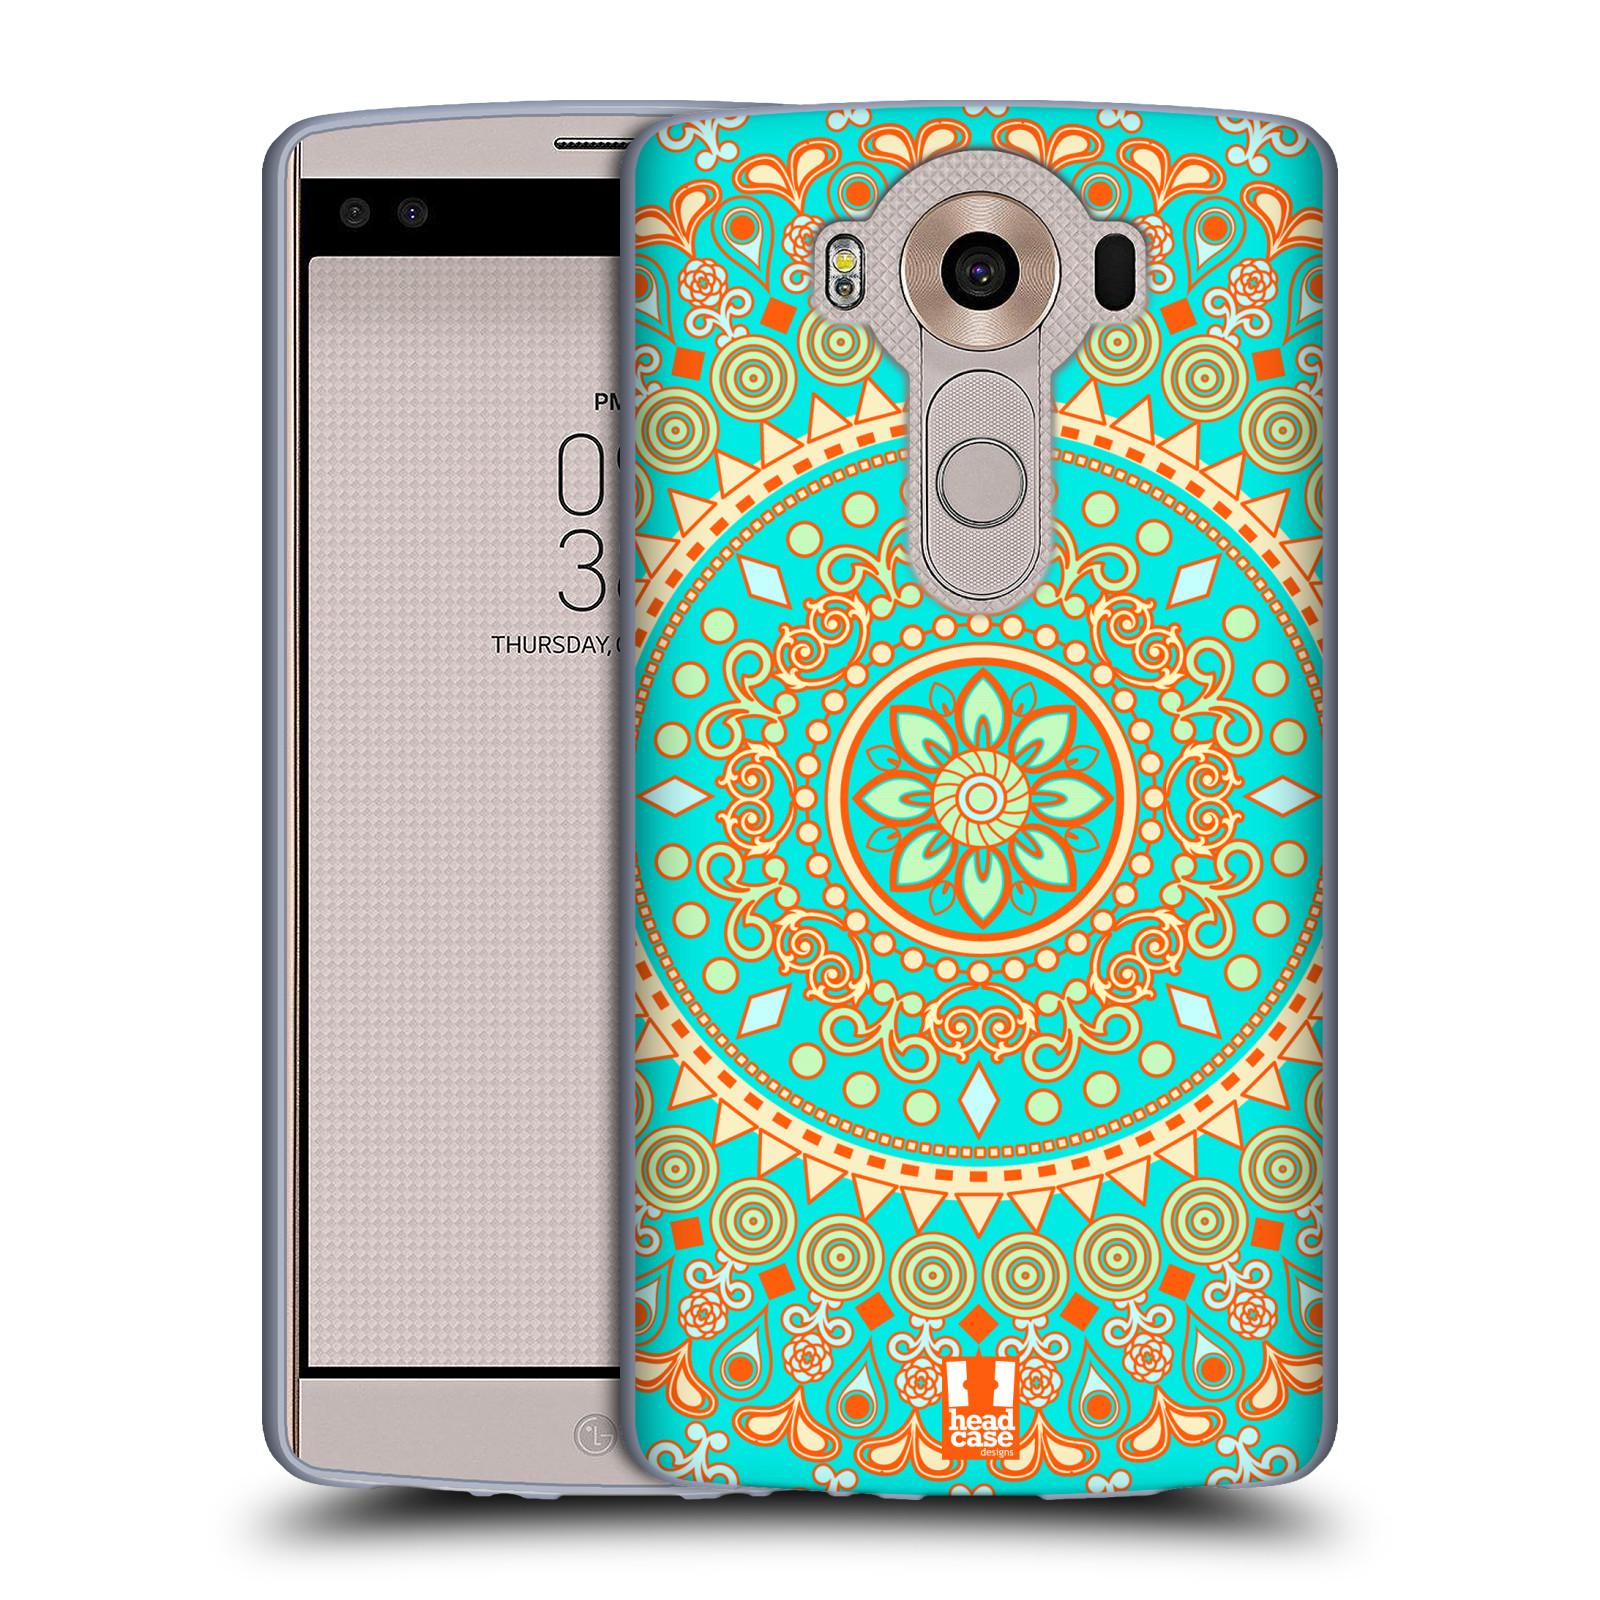 HEAD CASE silikonový obal na mobil LG V10 (H960A) vzor Indie Mandala slunce barevný motiv TYRKYSOVÁ, ZELENÁ